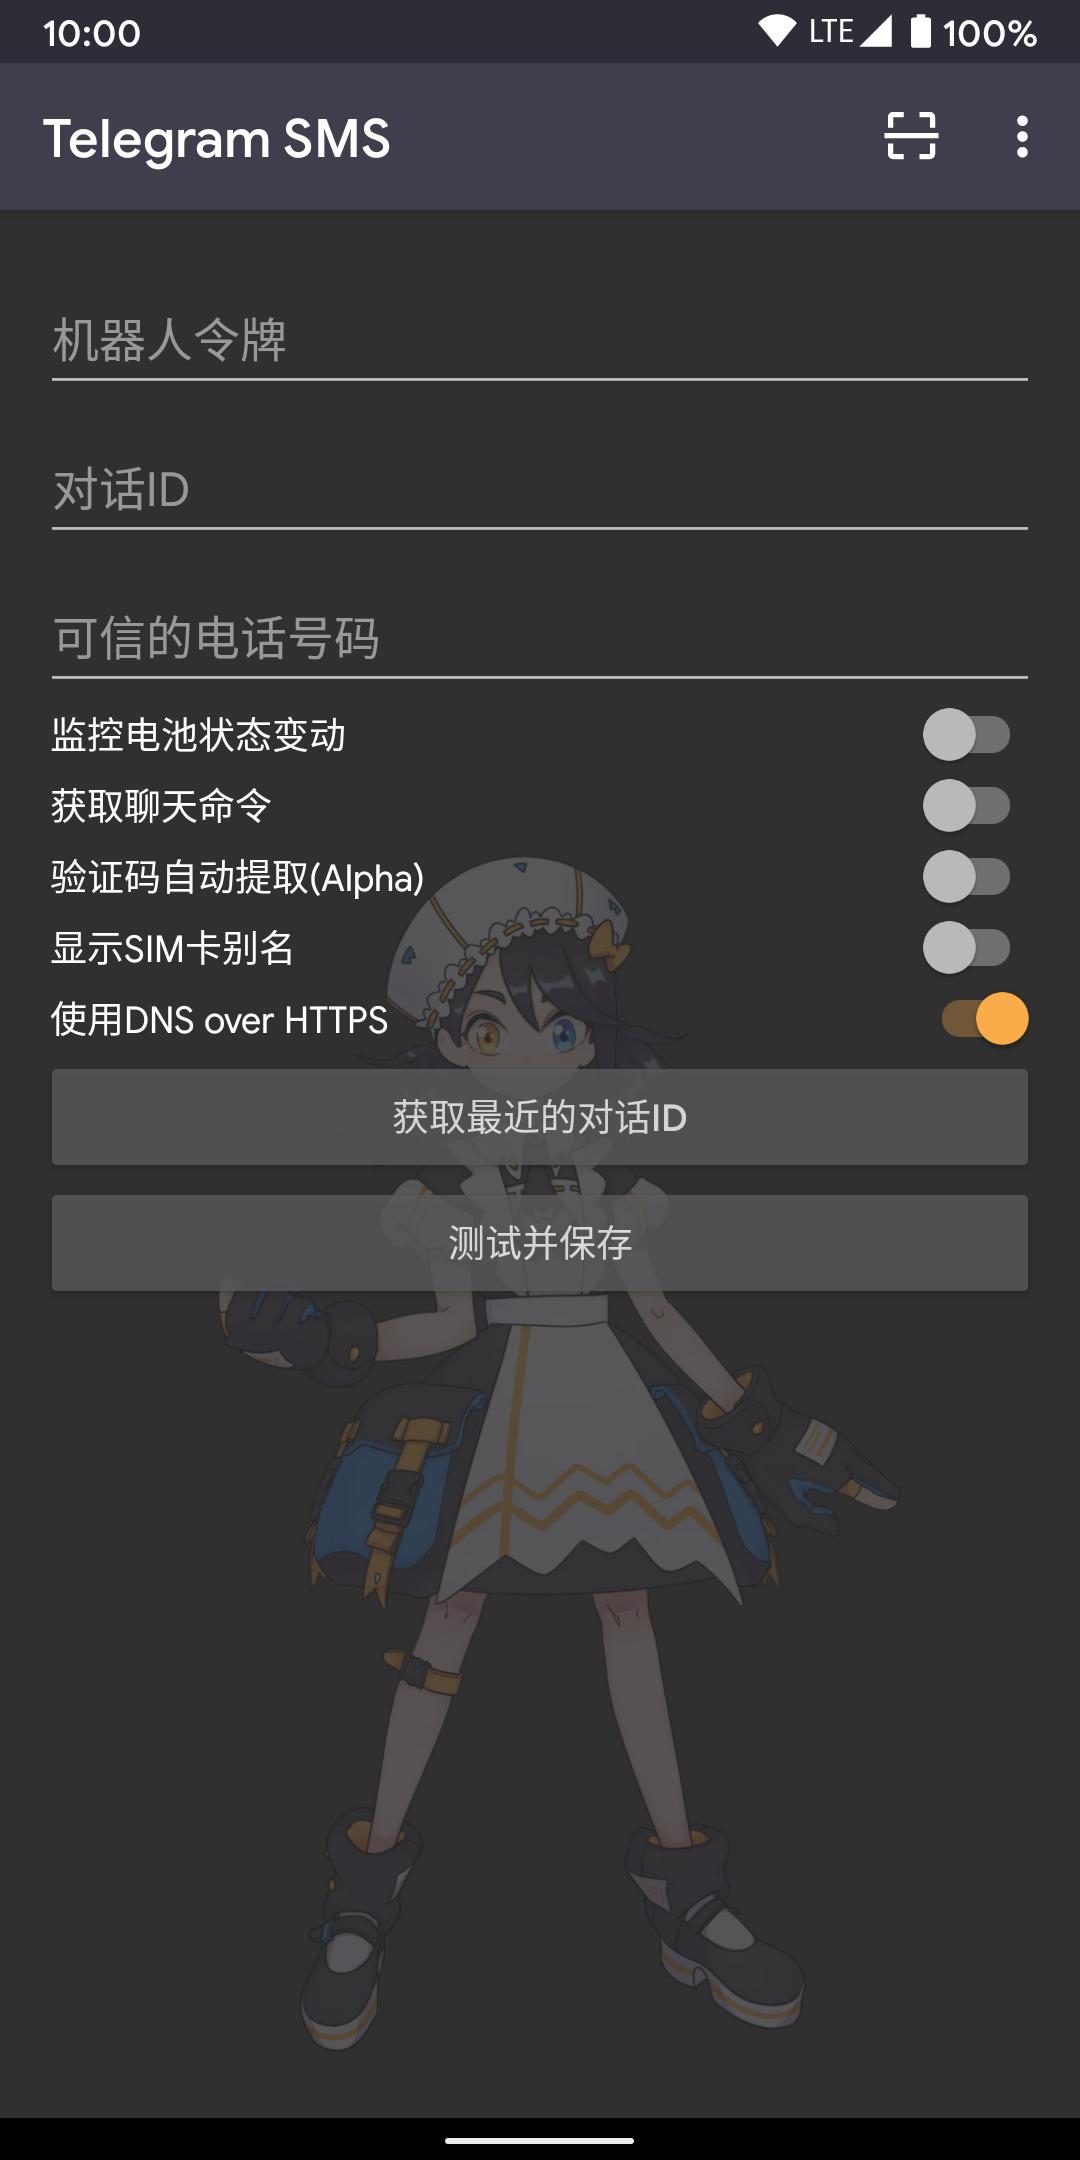 Screenshot_20201029-194330_Telegram_SMS.png